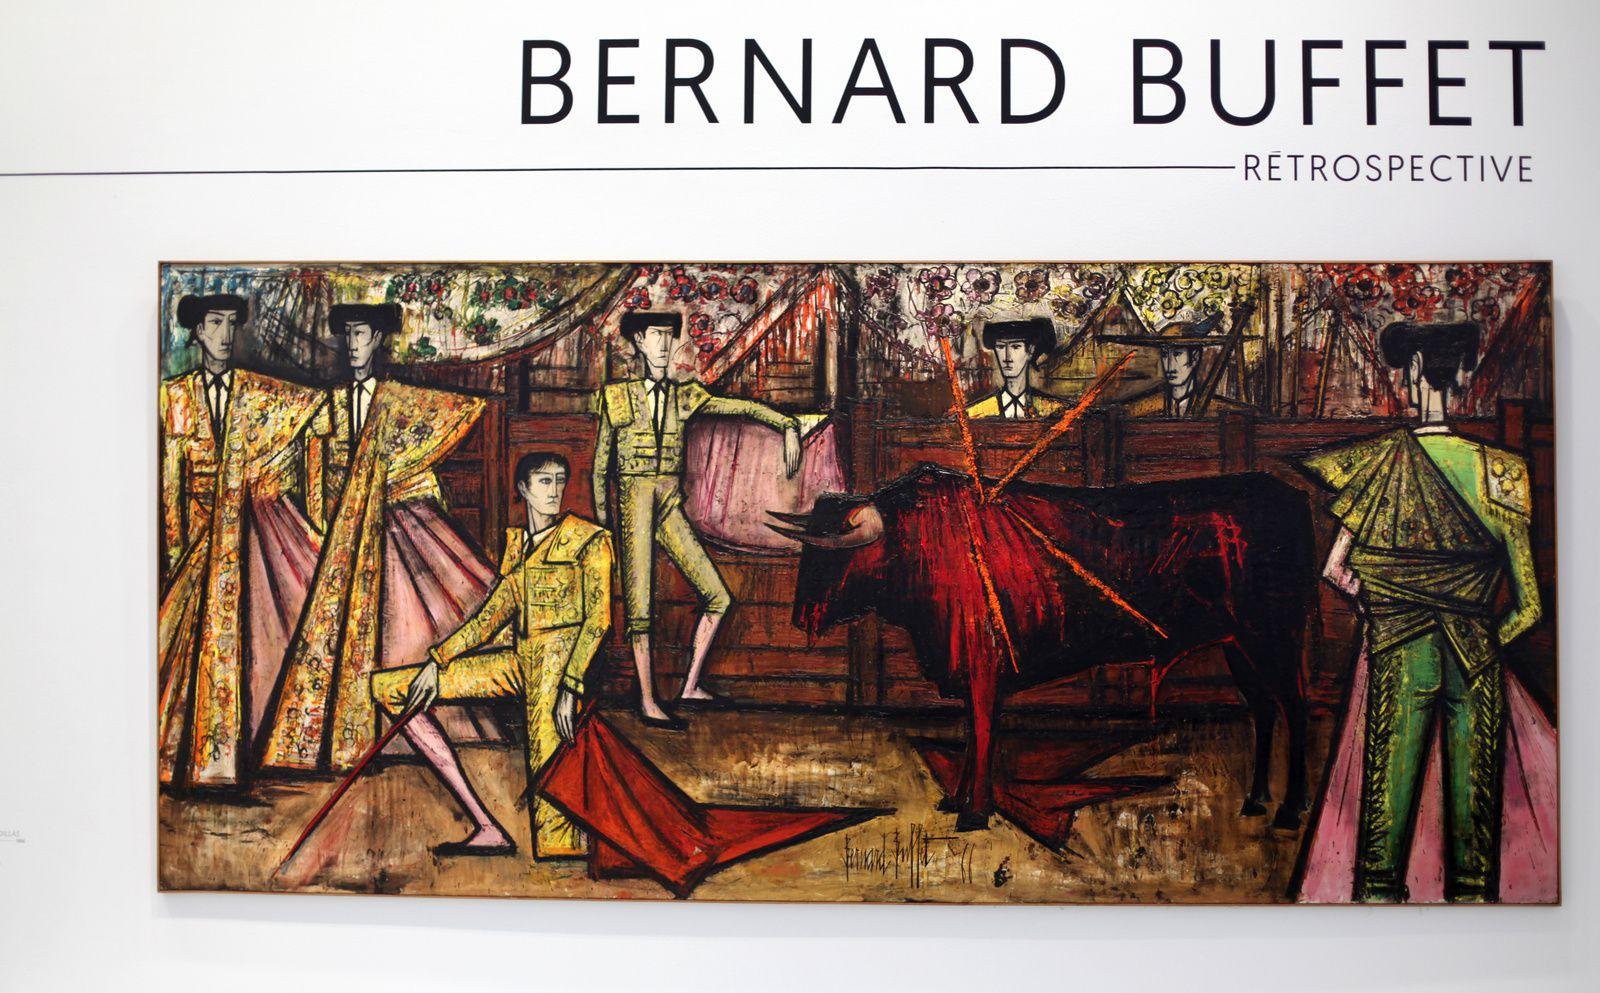 La Corrida : Desplante de Rodillas, Bernard Buffet (1967)